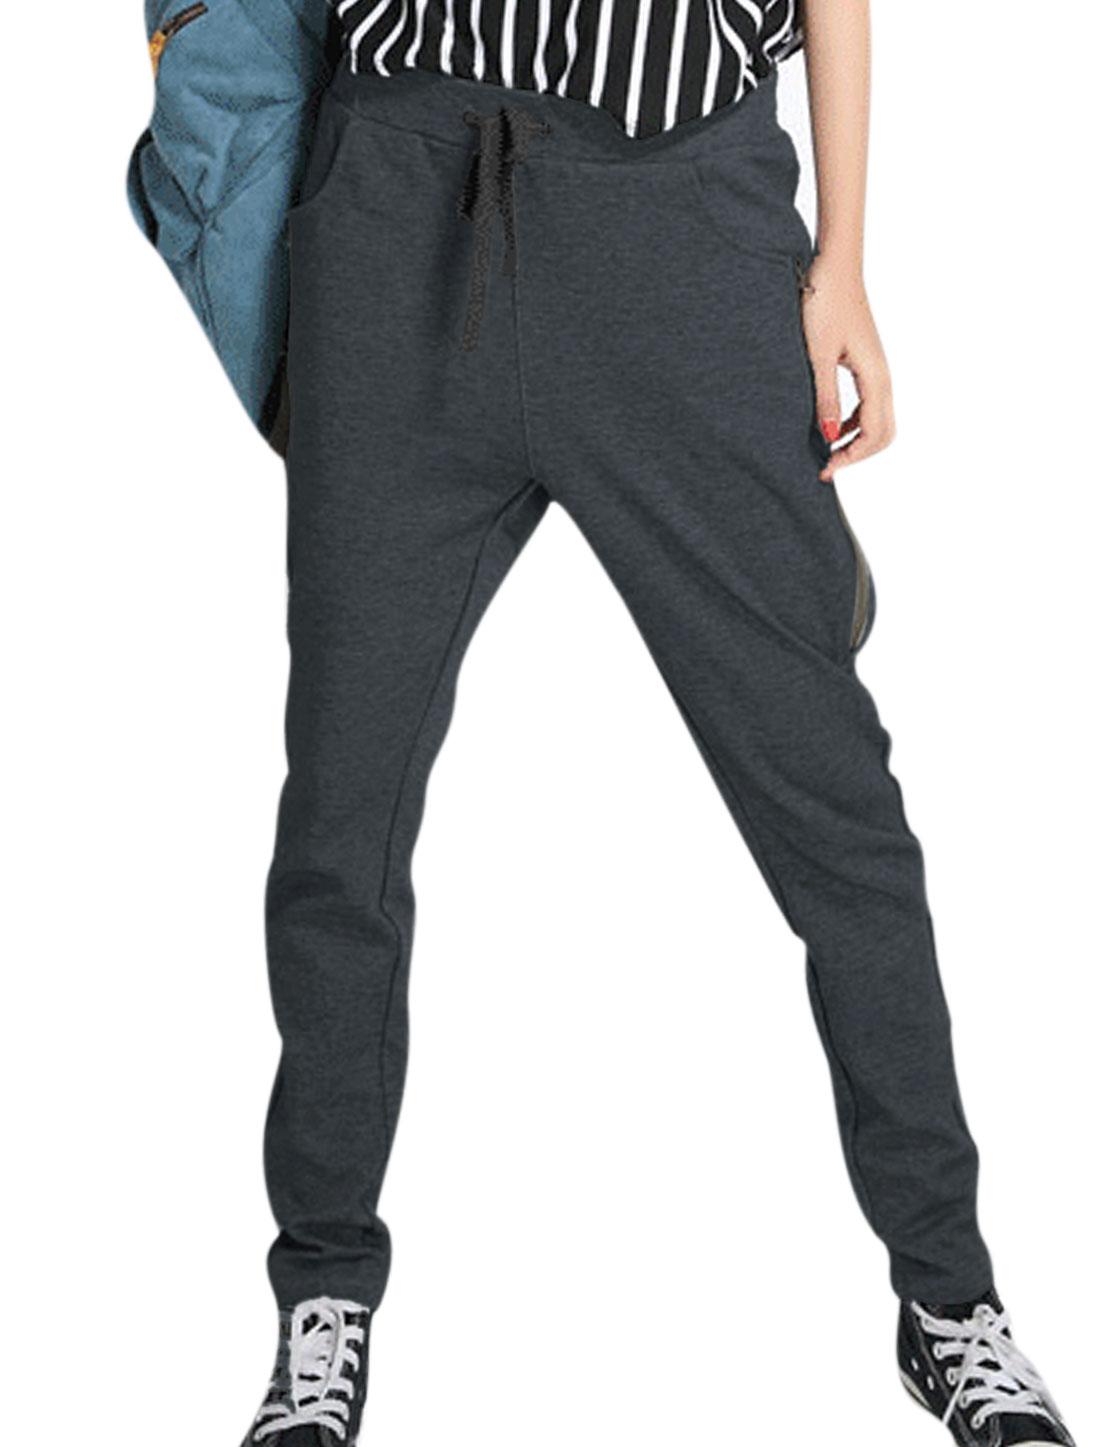 Women Drawstring Elastic Waist Zip Up Sides Casual Pants Dark Gray S